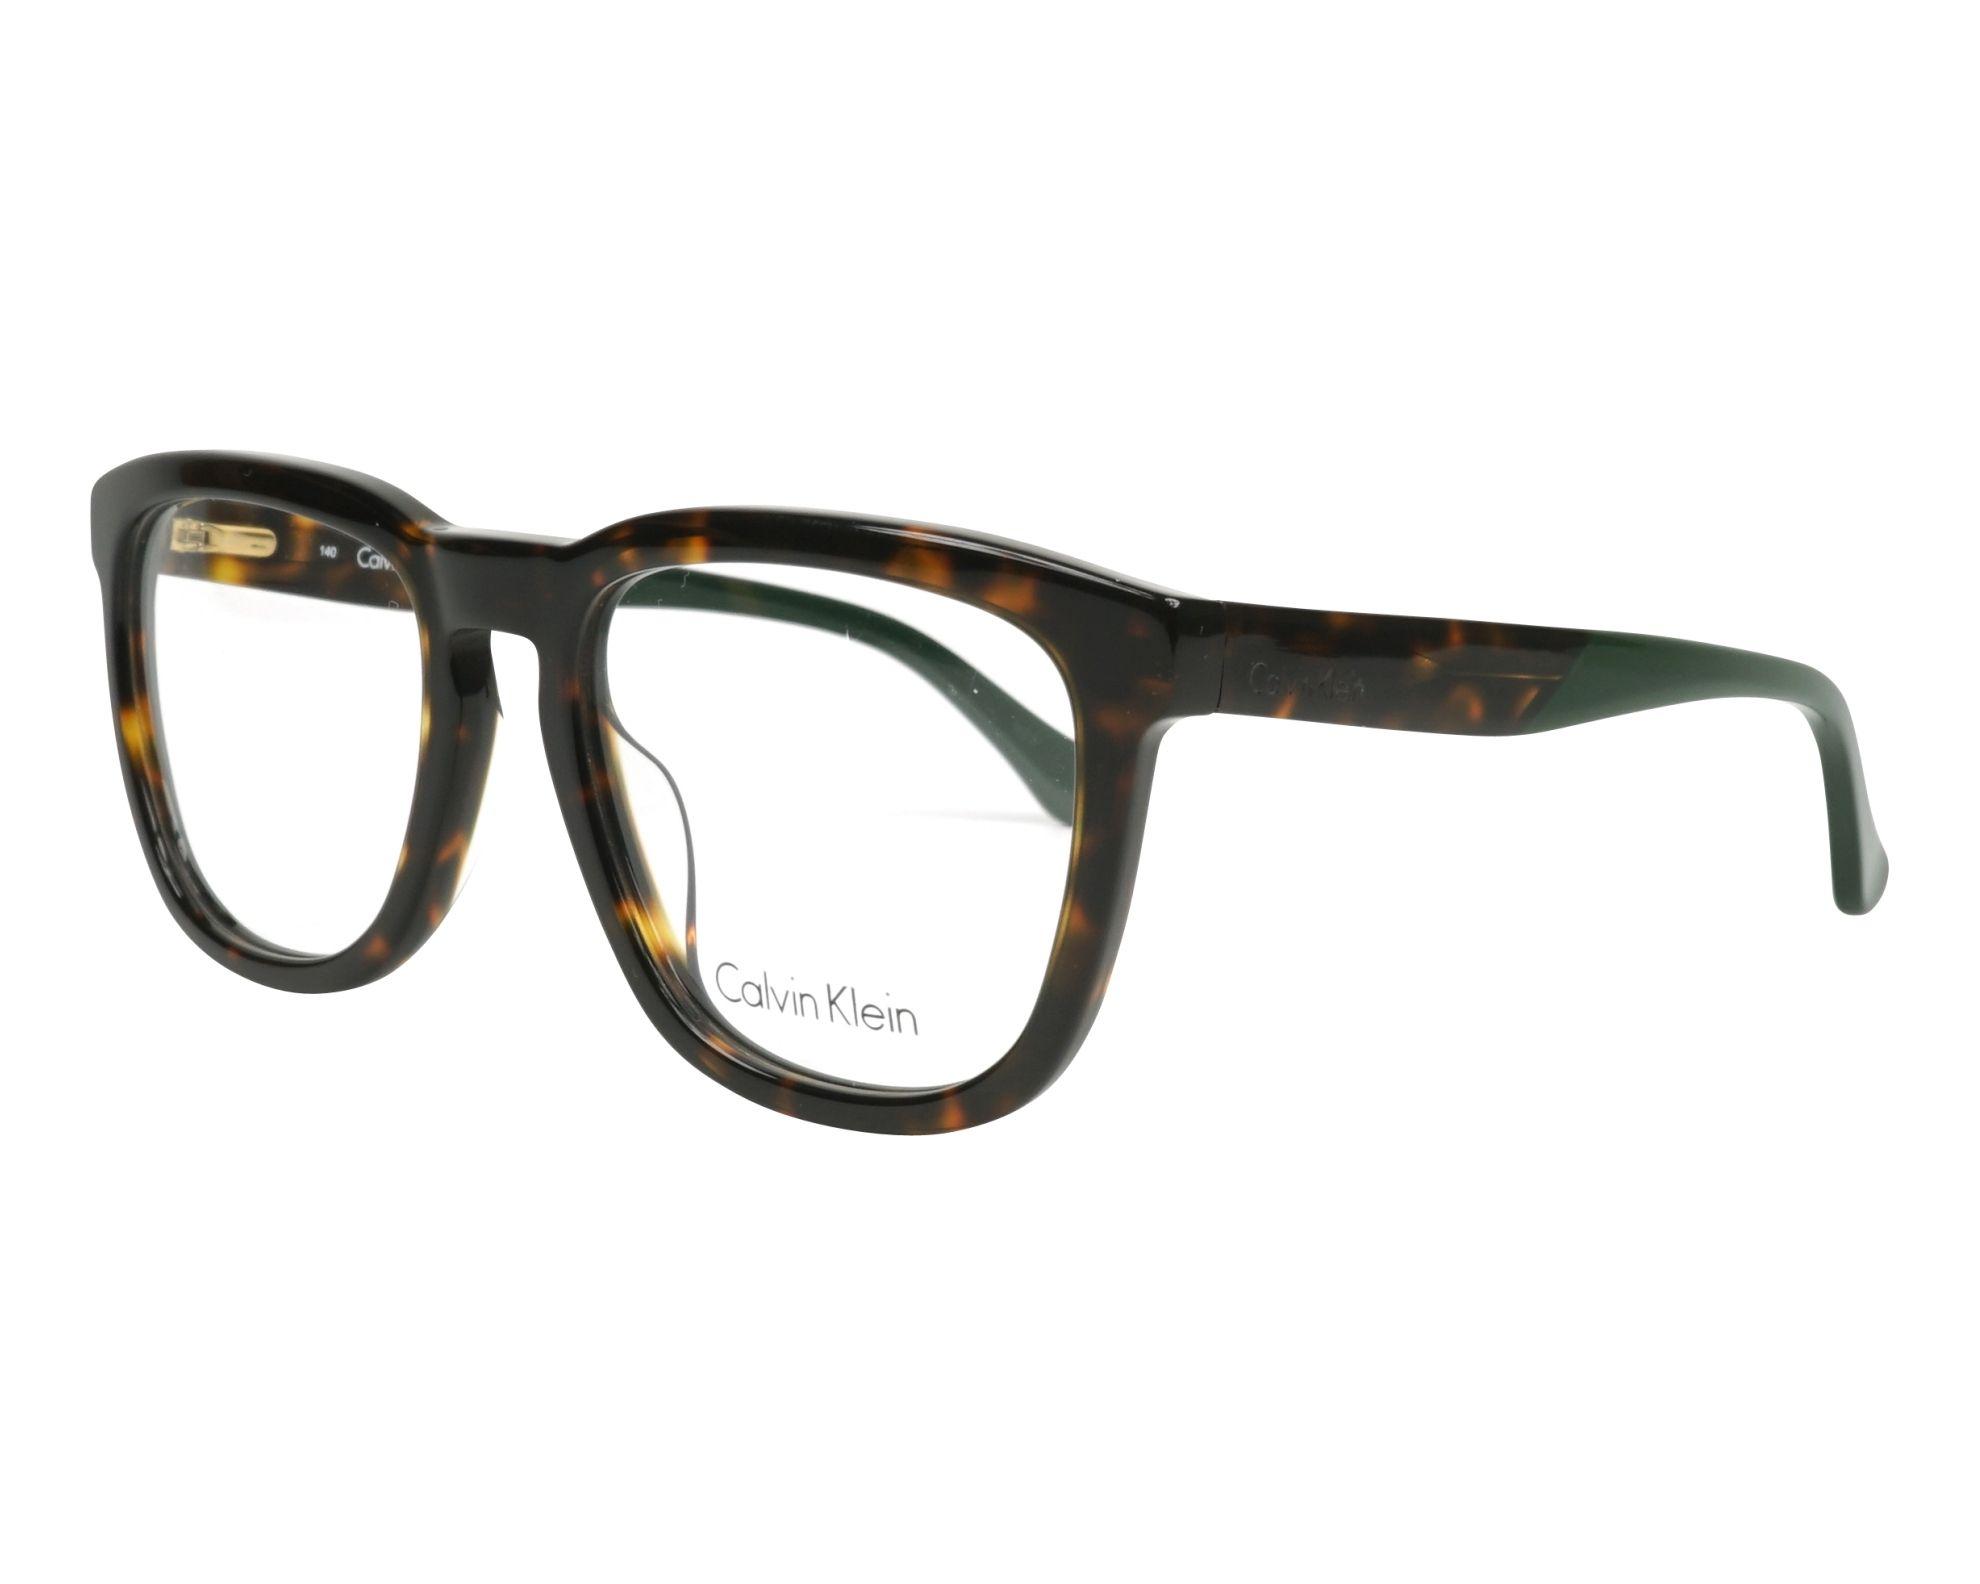 371f1b9d0c Gafas Graduadas Calvin Klein CK-5924 214 54-19 Havana Verde vista de perfil